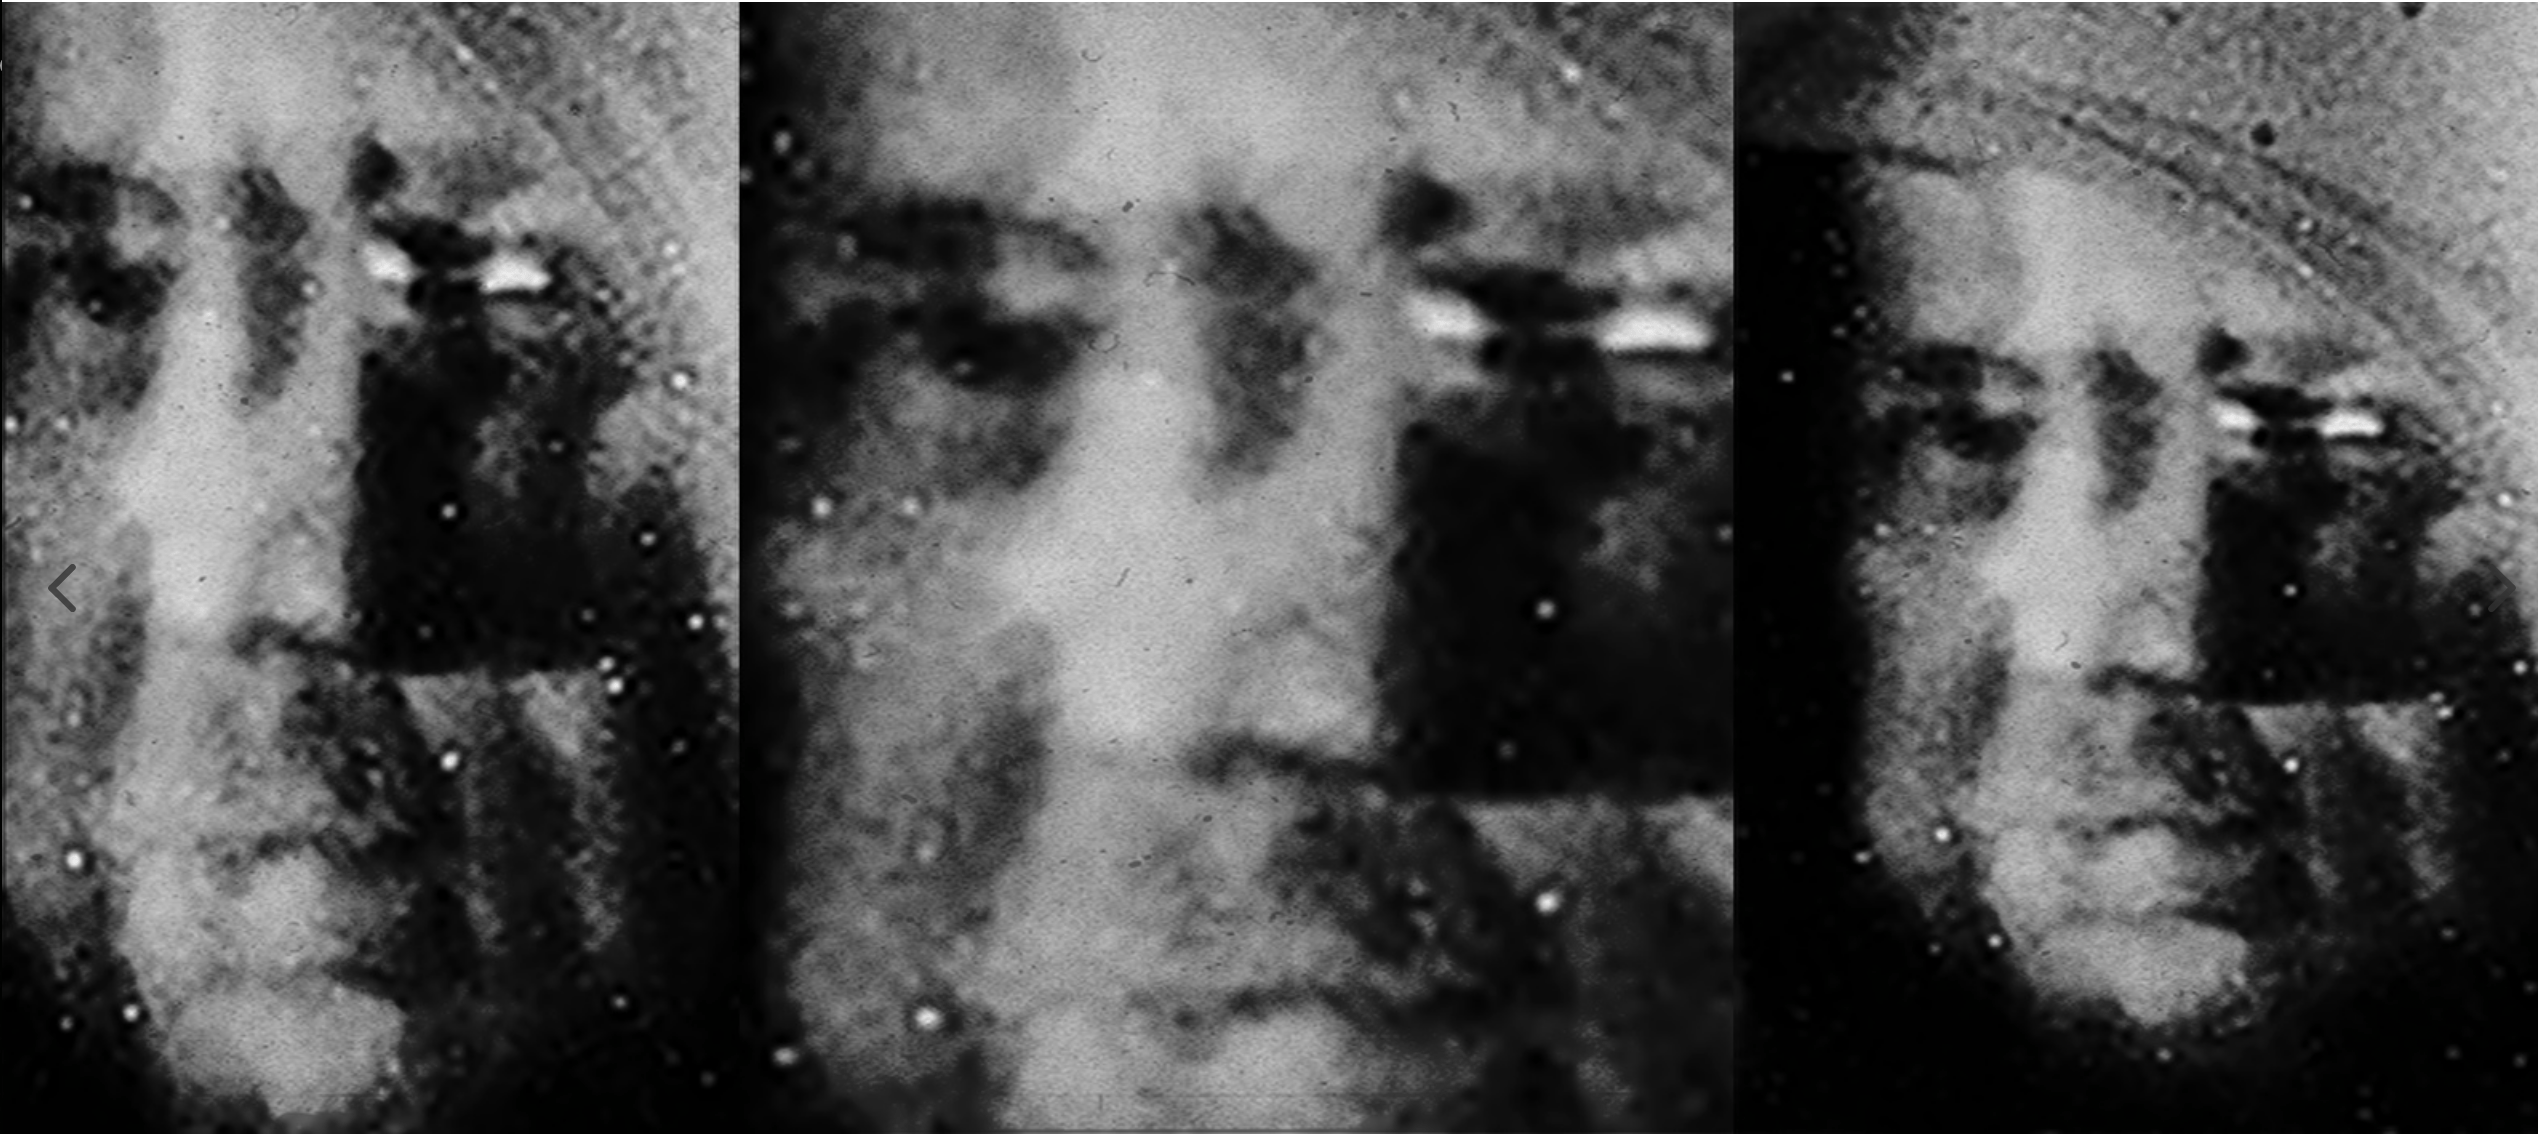 SERGEY MELNITCHENKO: FUNDAMENTAL SPACE EXPLORATIONS OF NAKED SINGULARITY